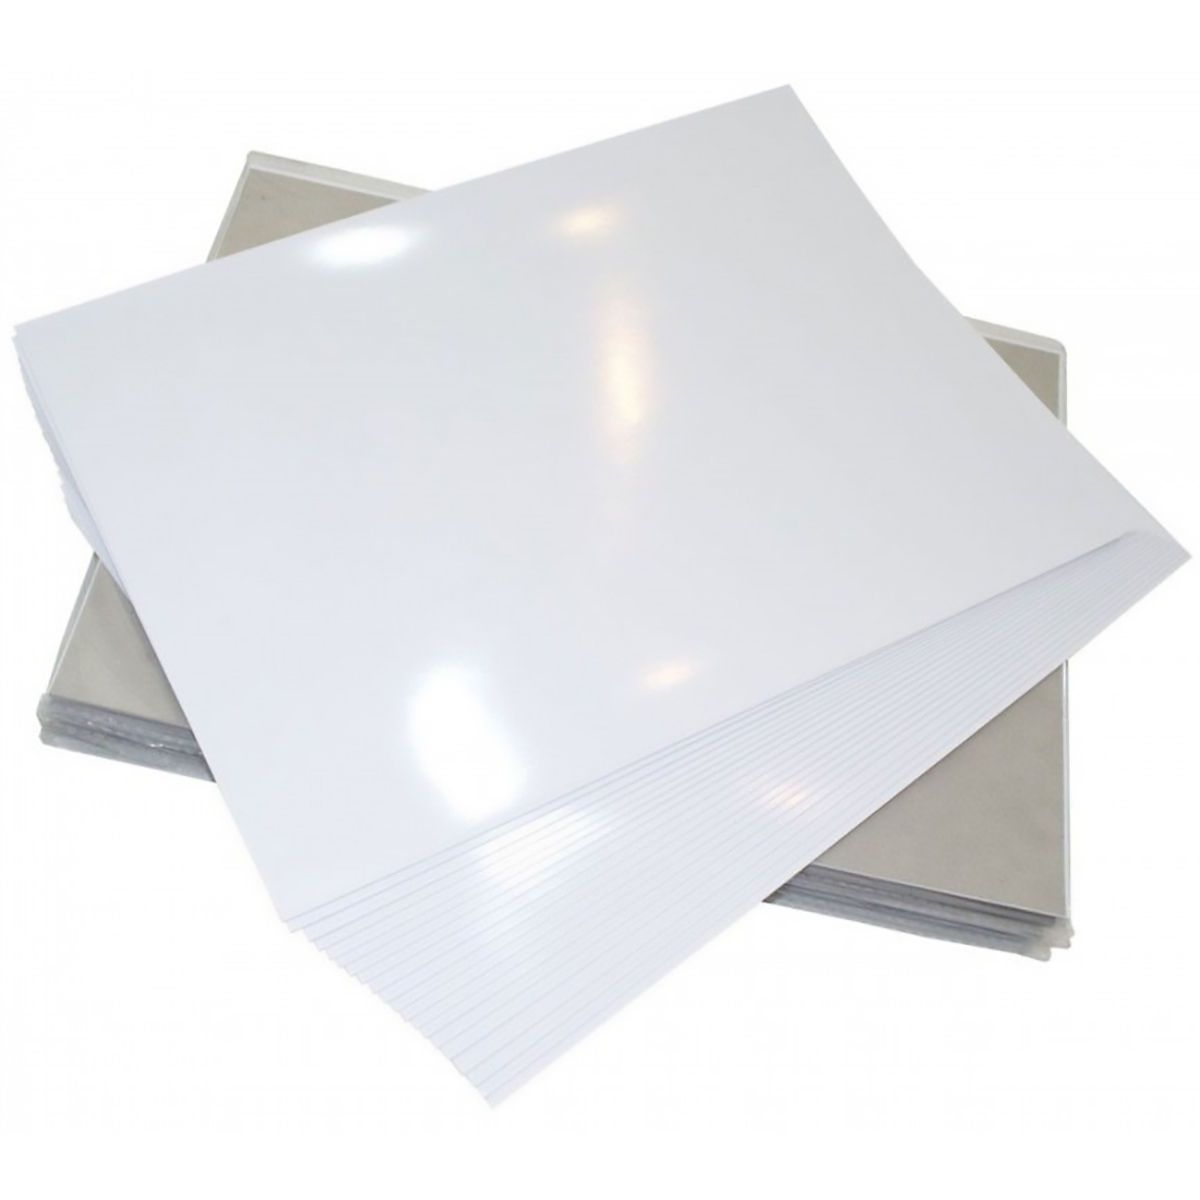 Papel Dupla Face Fotográfico 180g Glossy A4 Branco Brilhante Resistente à Água / 20 folhas